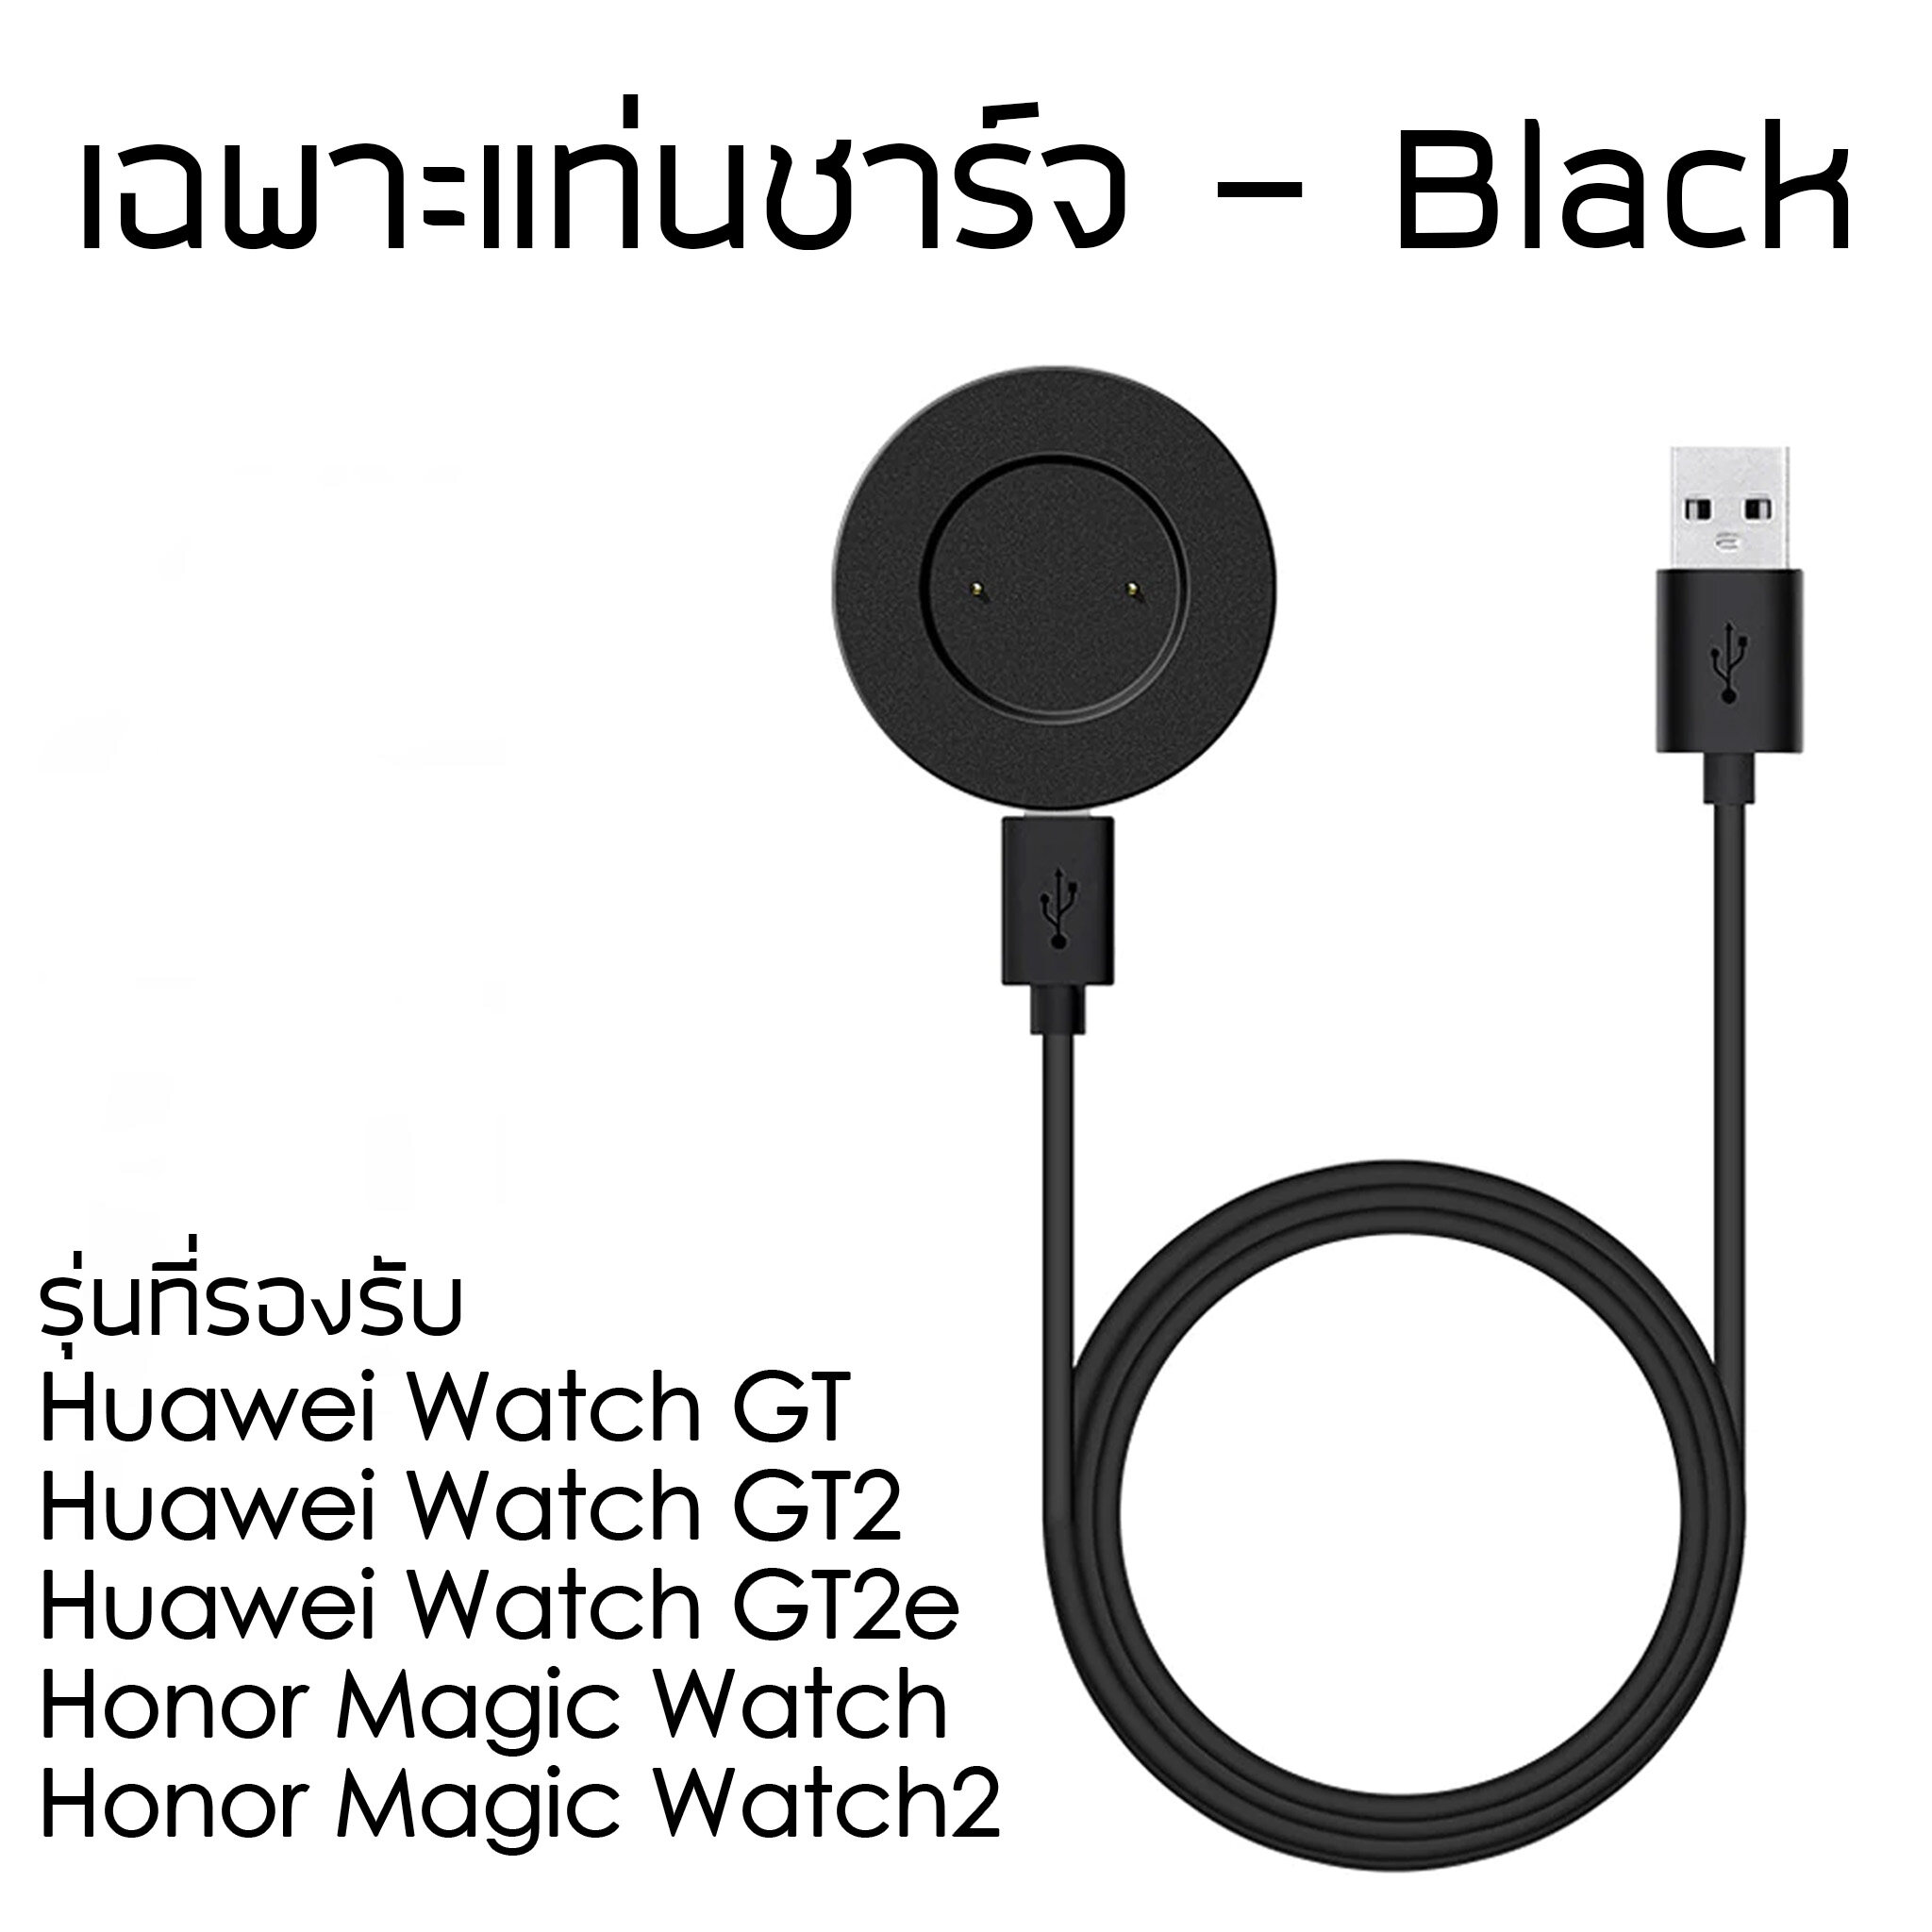 As แท่นชาร์จ For Huawei Watch GT2 Pro / Watch Fit / GT2 / GT / Magic Watch น้ำหนักเบา พกพาง่าย พร้อม Adapter และสาย USB